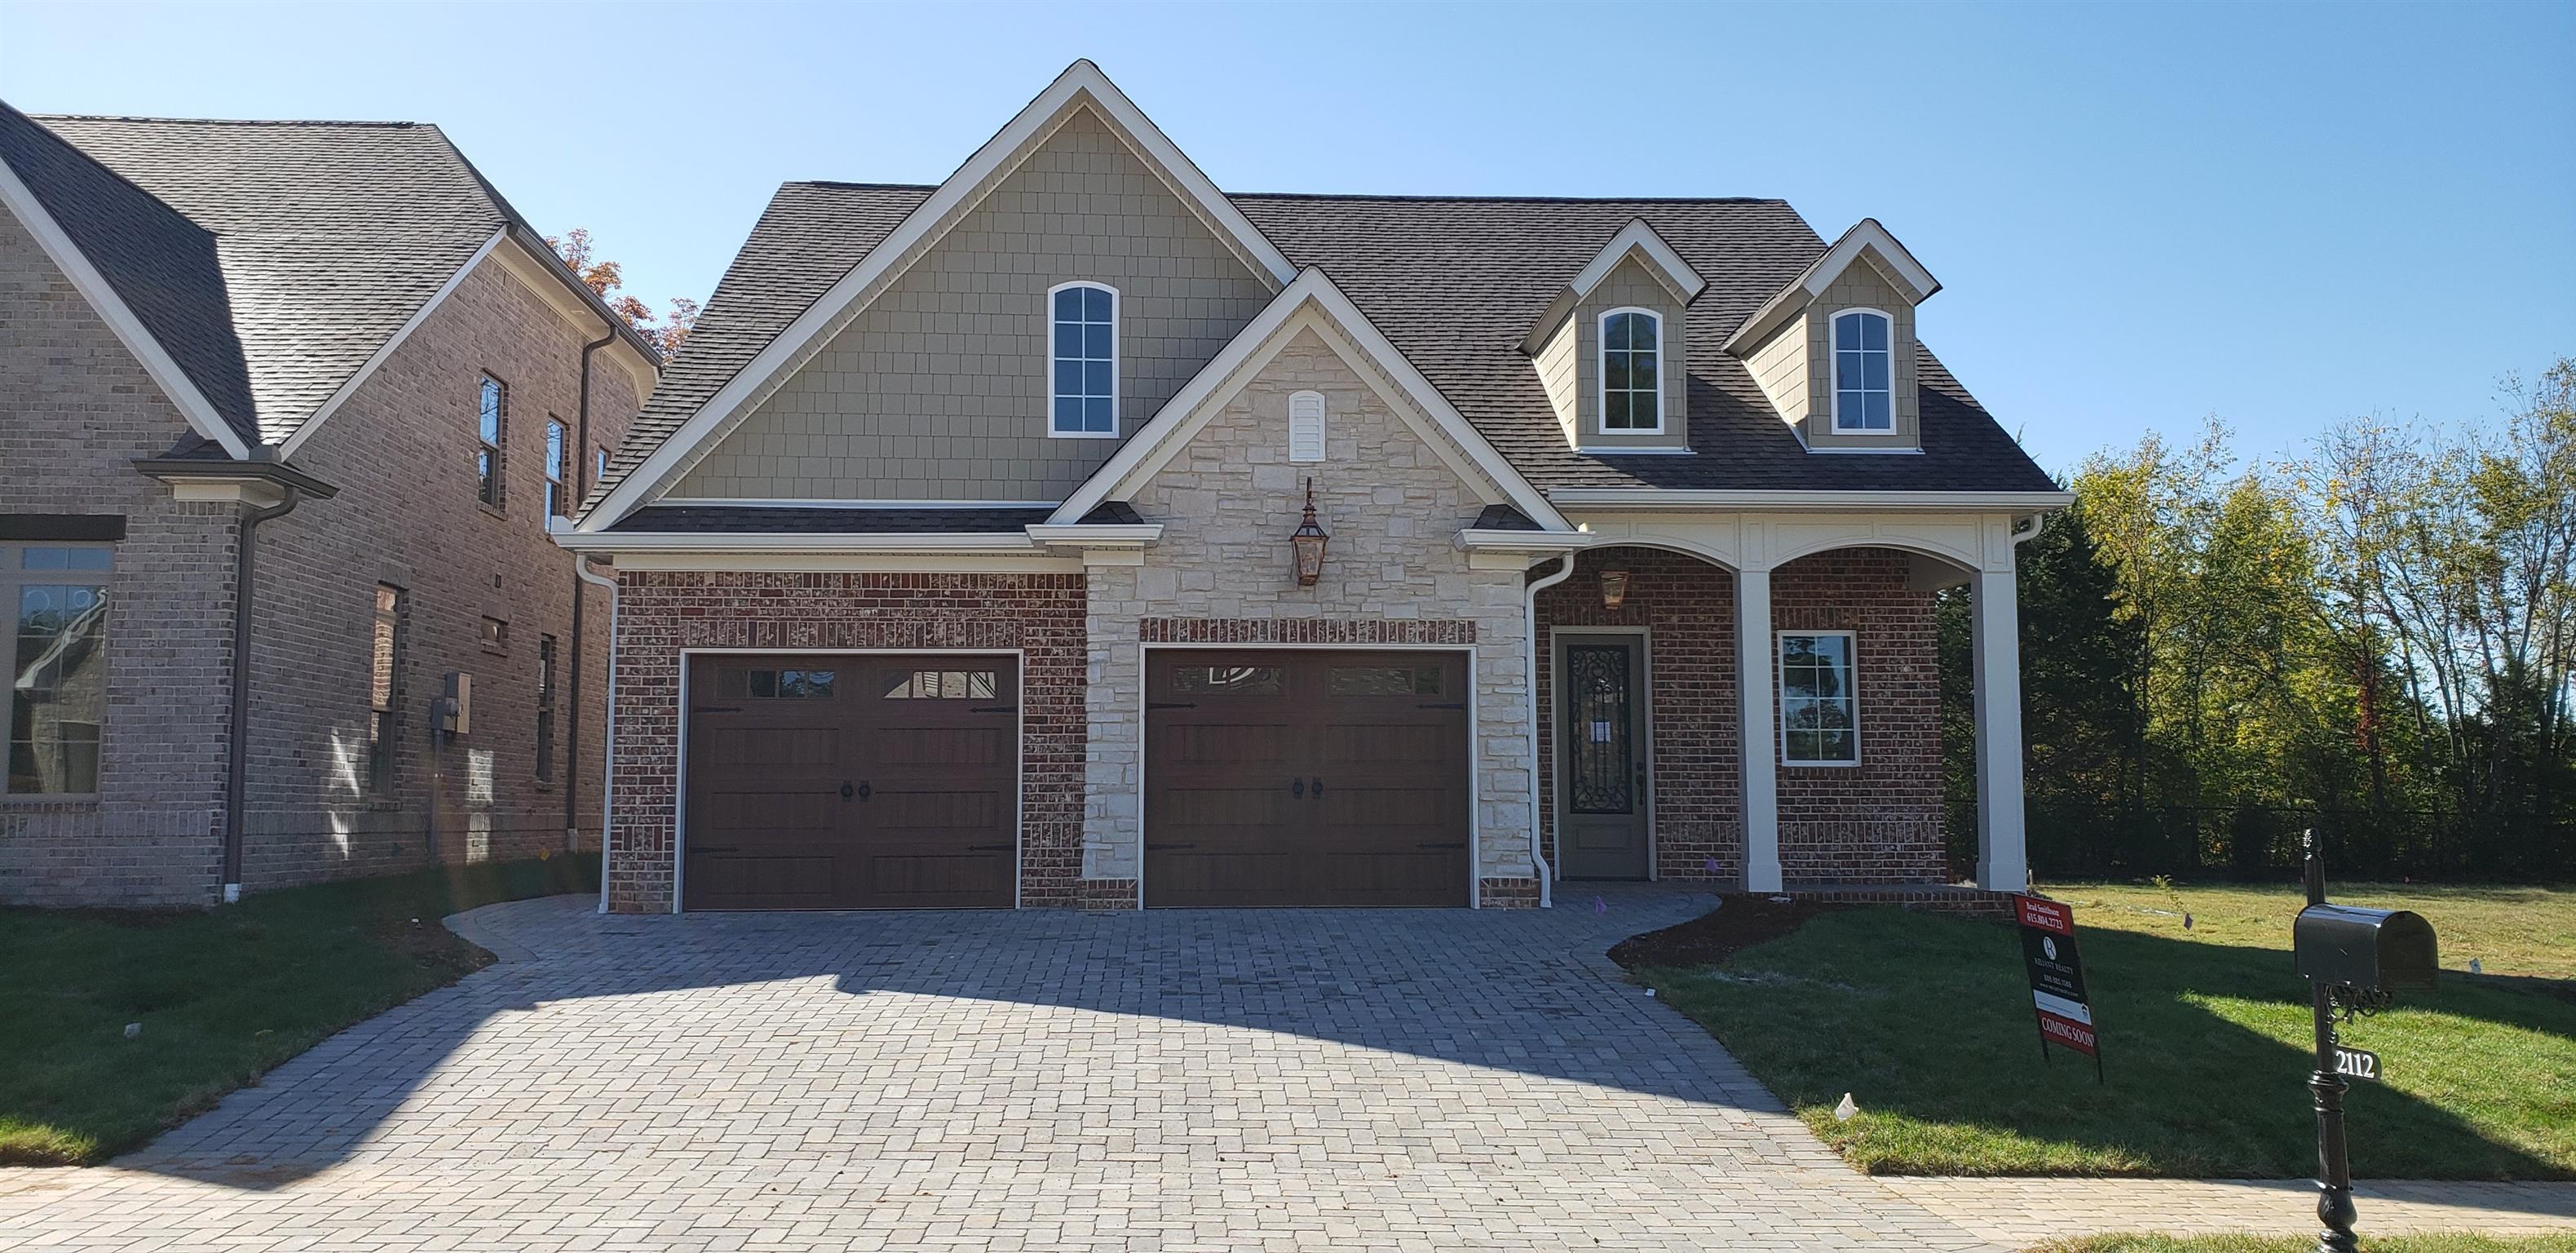 2112 White Poplar Ct, Murfreesboro, TN 37130 - Murfreesboro, TN real estate listing